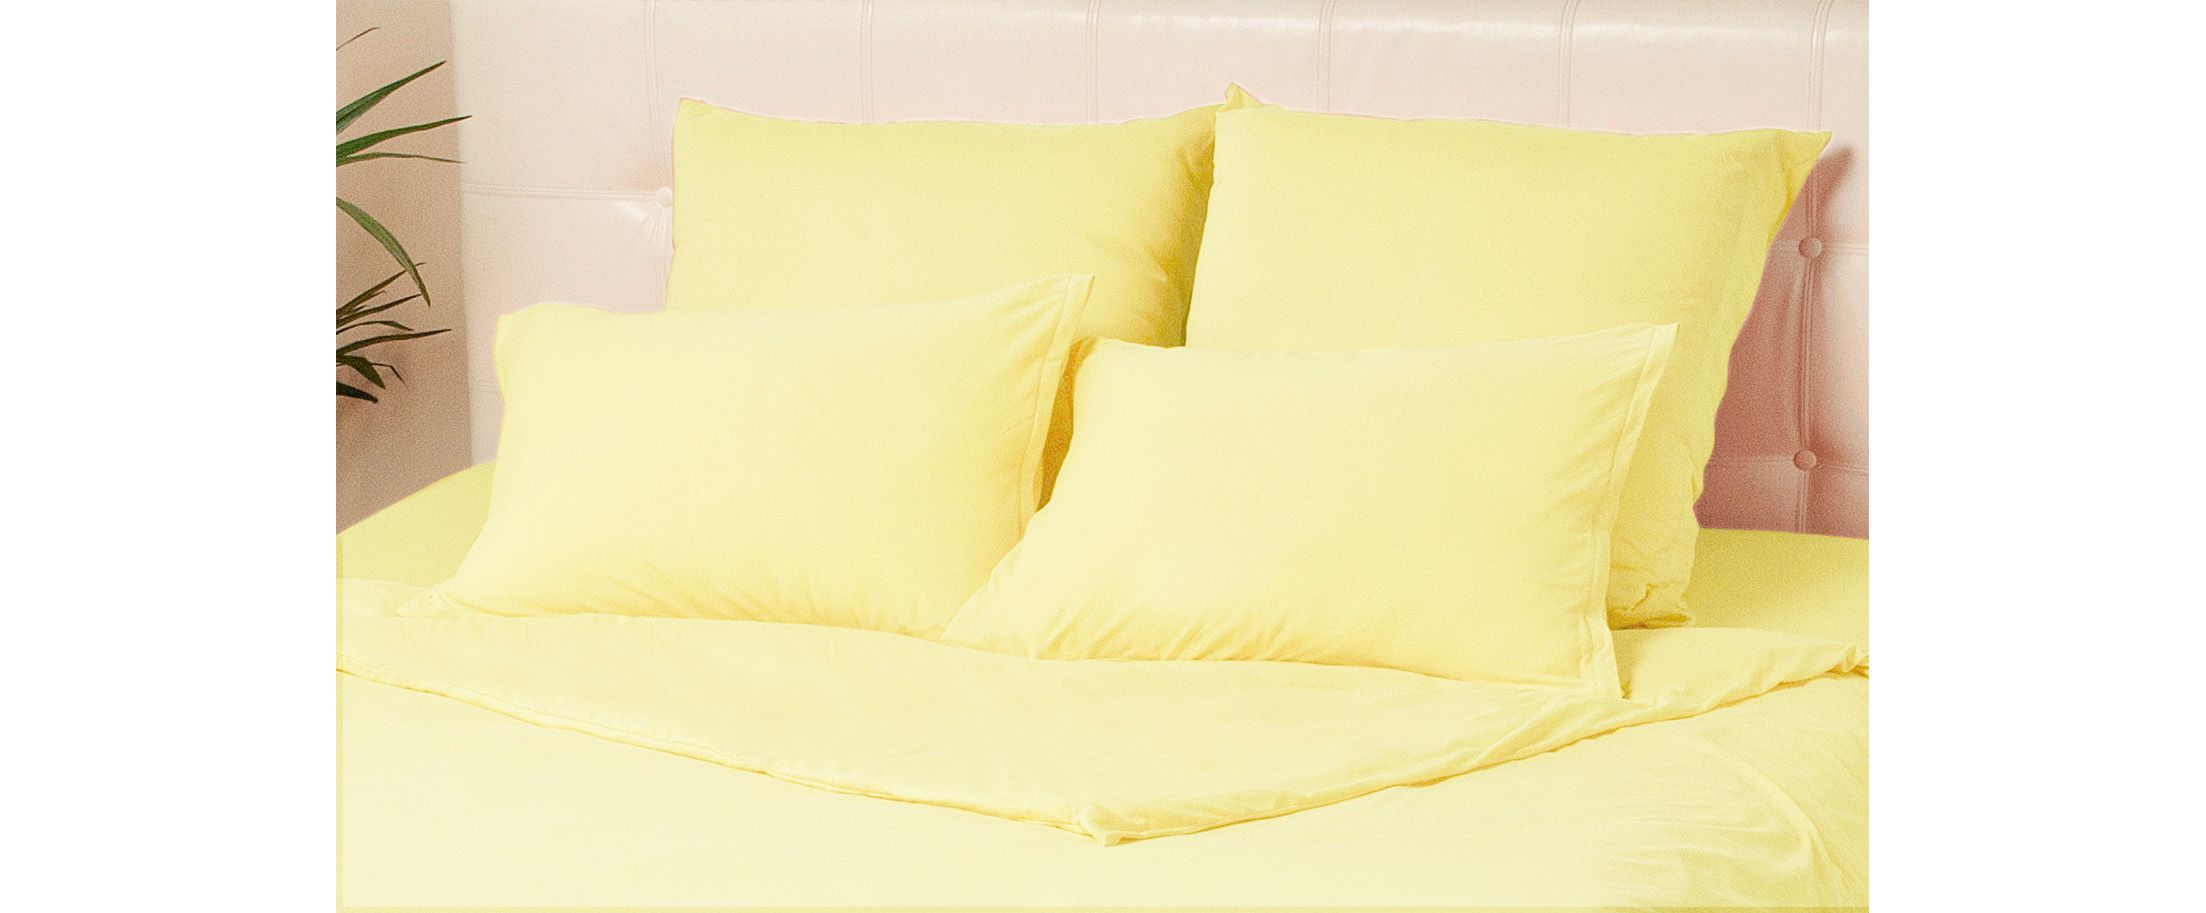 Комплект наволочек на молнии 70х70 желтого цвета Violett Модель 4002Комплект наволочек на молнии 70х70 желтого цвета Violett Модель 4002. Артикул К000693<br>